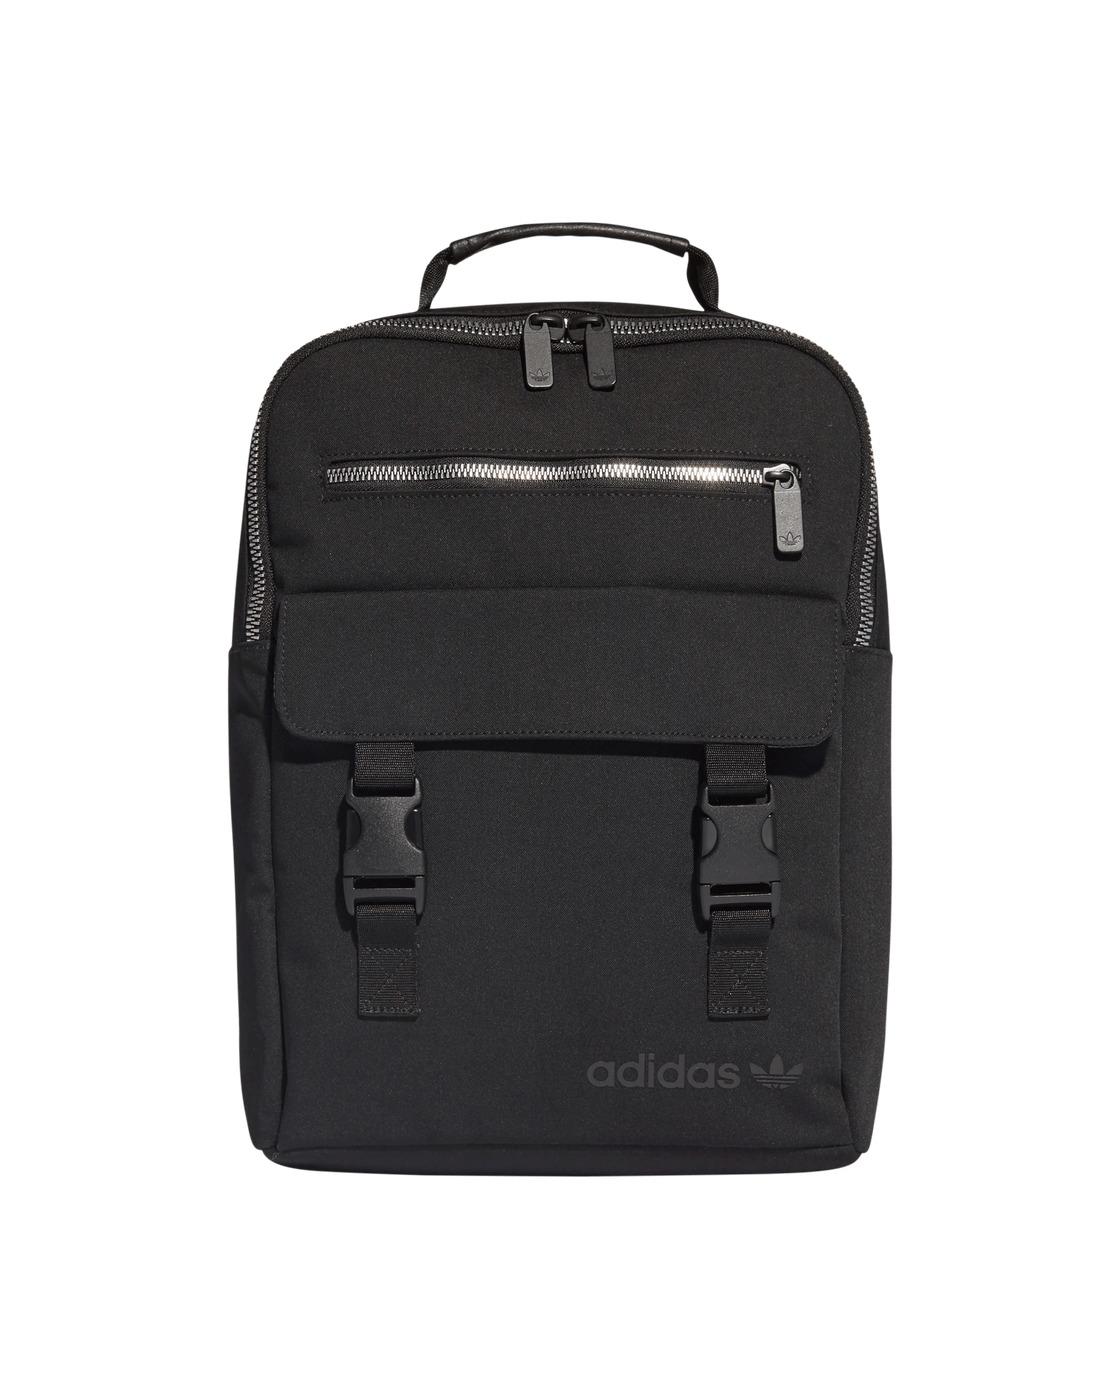 Adidas Originals Modern Sport Backpack Black